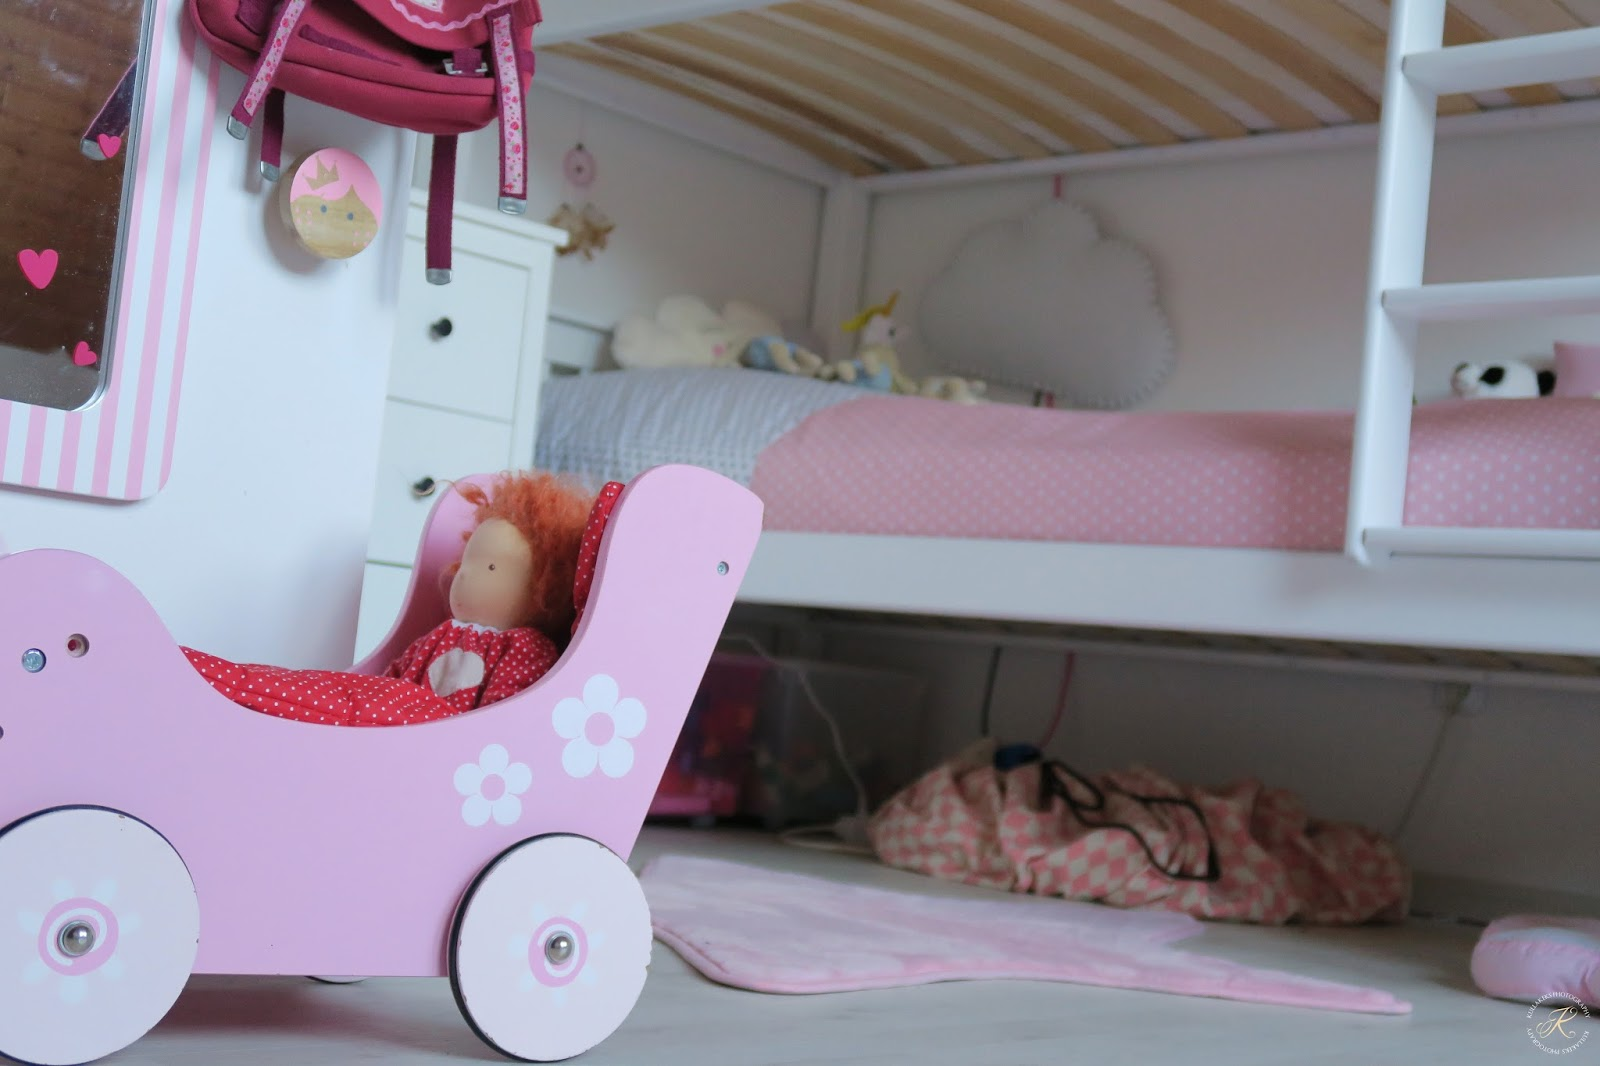 Kidsroom // Willkommen im Mädchenzimmer - Kullakeks